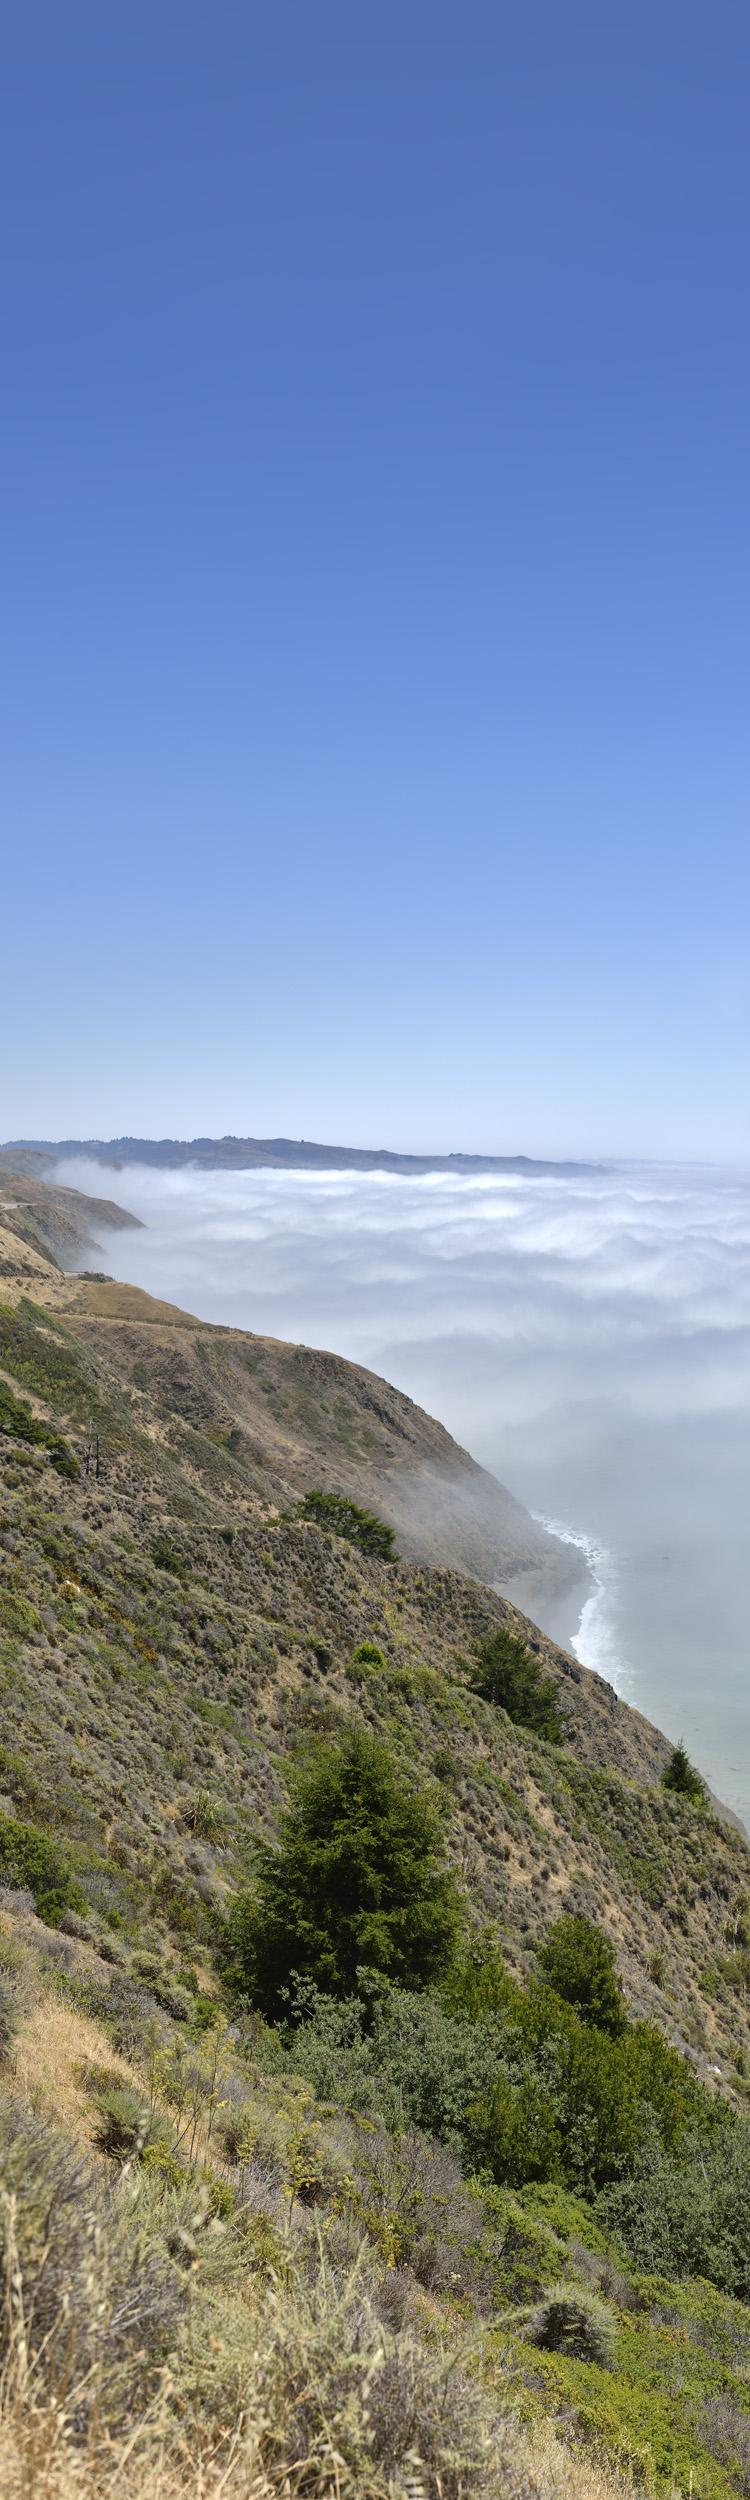 Fog on Coast, California